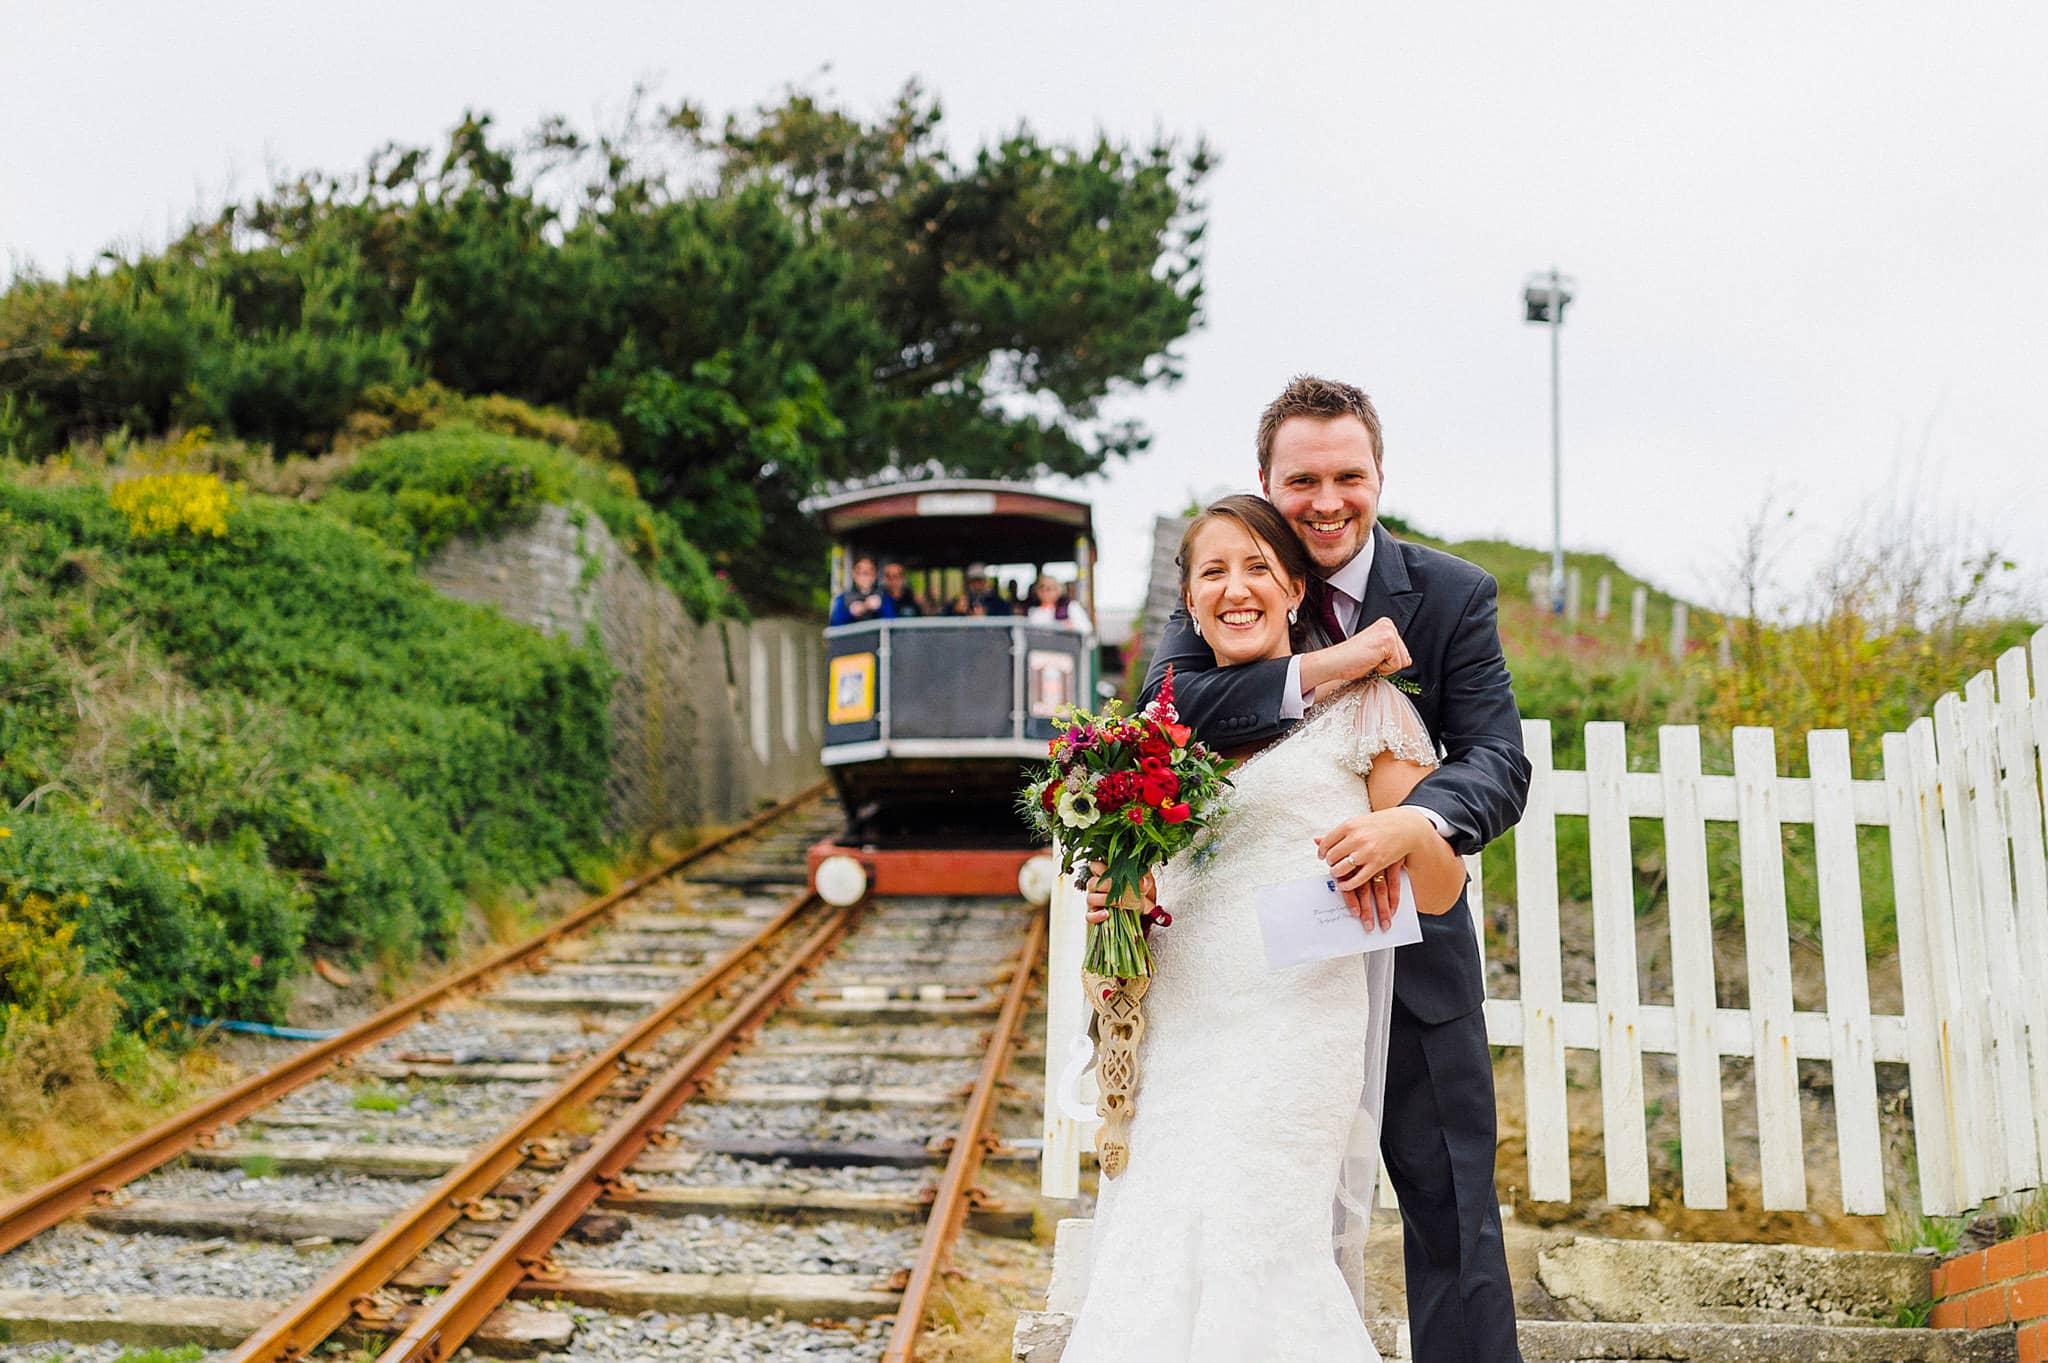 wedding-photographer-aberystwyth-wales (115)